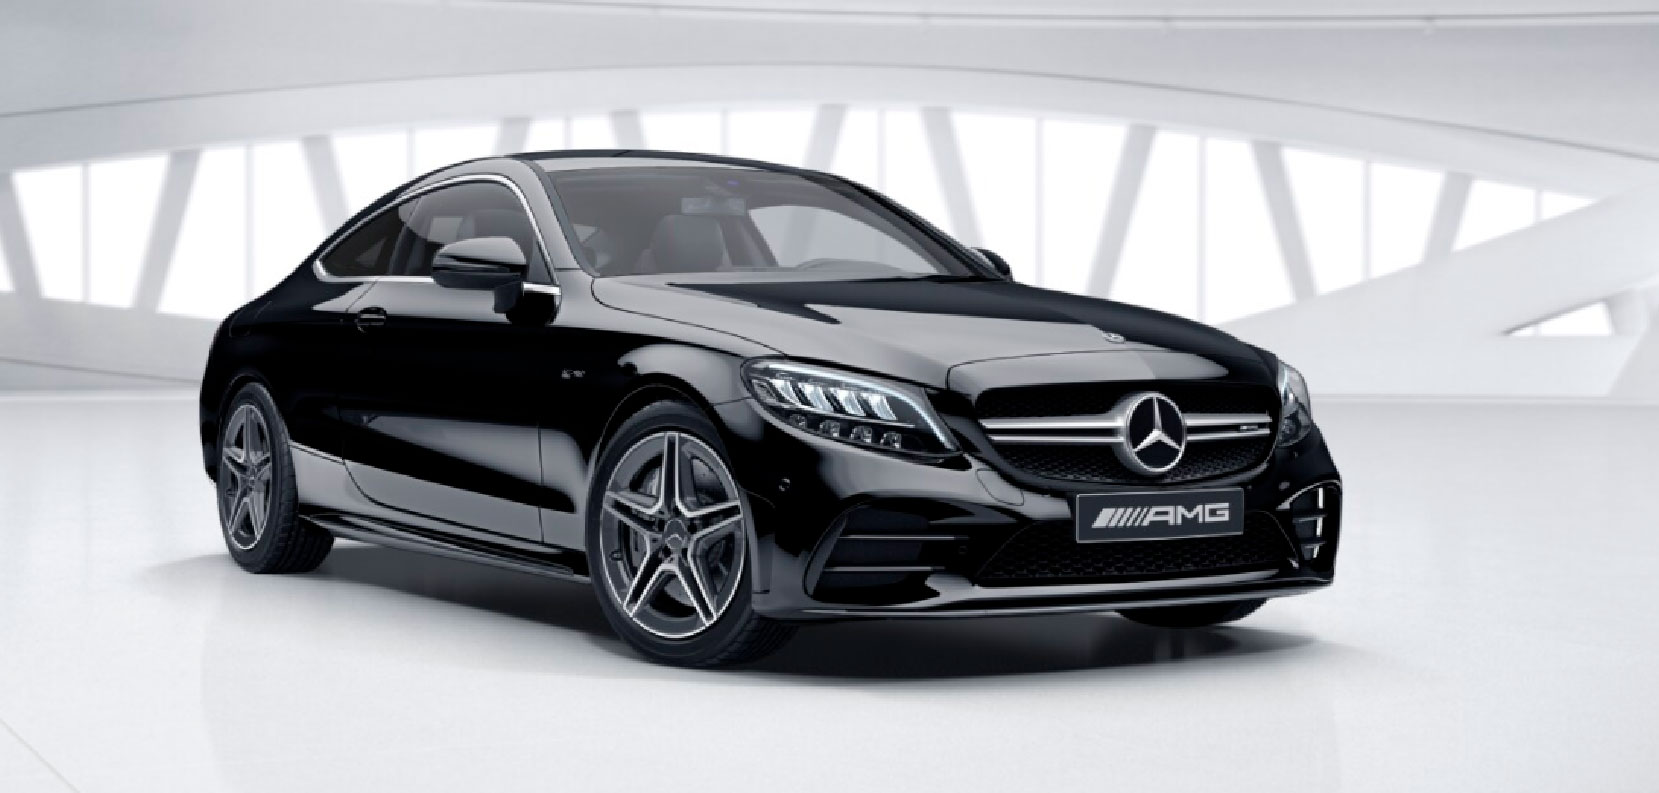 Mercedes-AMG C43 4МАТIC Coupe 0952620124